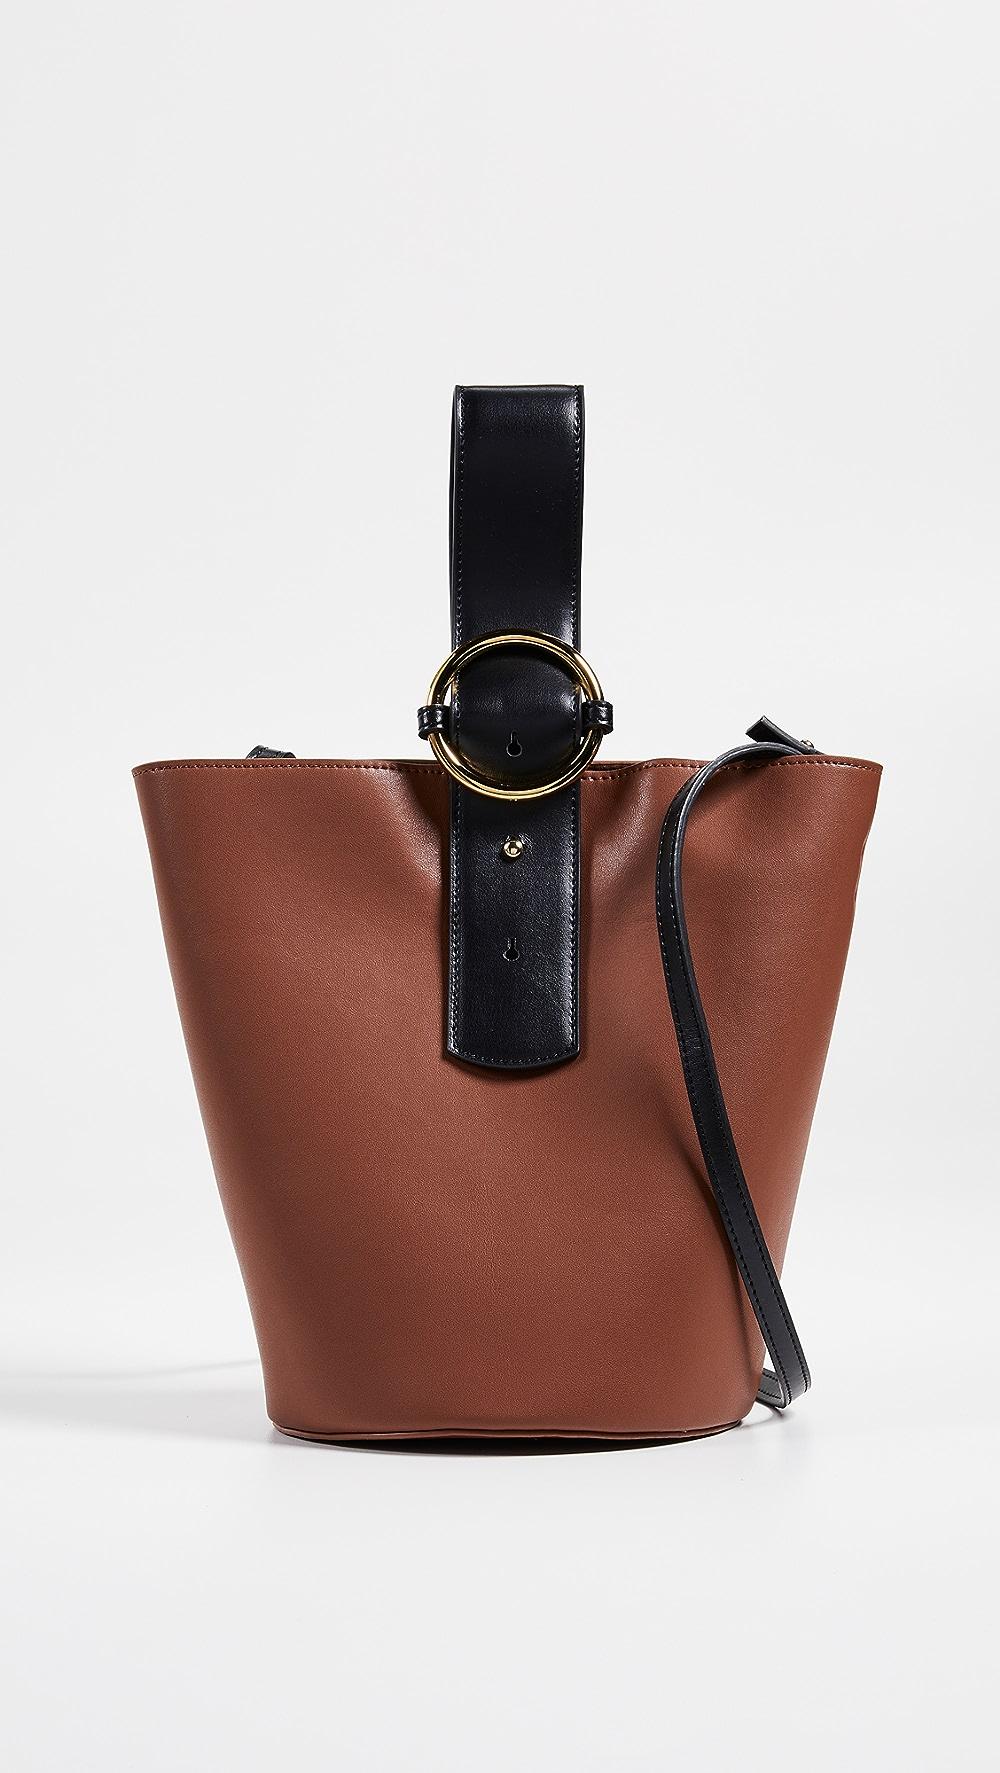 2019 New Style Parisa Wang - Addicated Bucket Bag Packing Of Nominated Brand